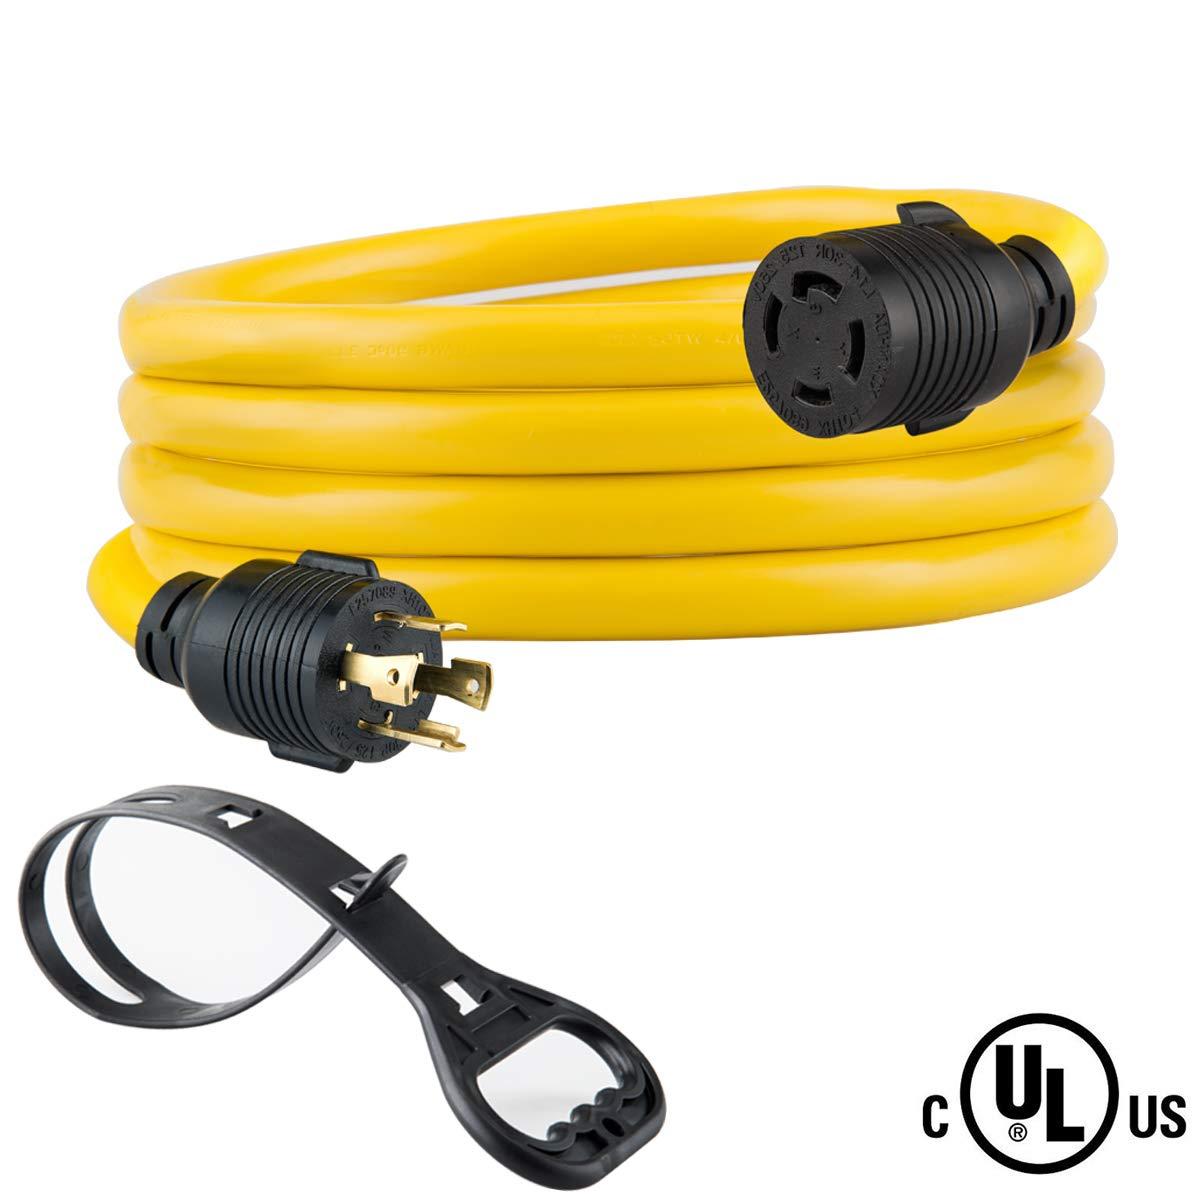 10 FEET Heavy Duty Generator Locking power cord NEMA L14-30P/L14-30R,4 prong 10 Gauge SJTW Cable, 125/250V 30Amp 7500 Watts Yellow Generator Lock Extension Cord With UL listed Yodotek